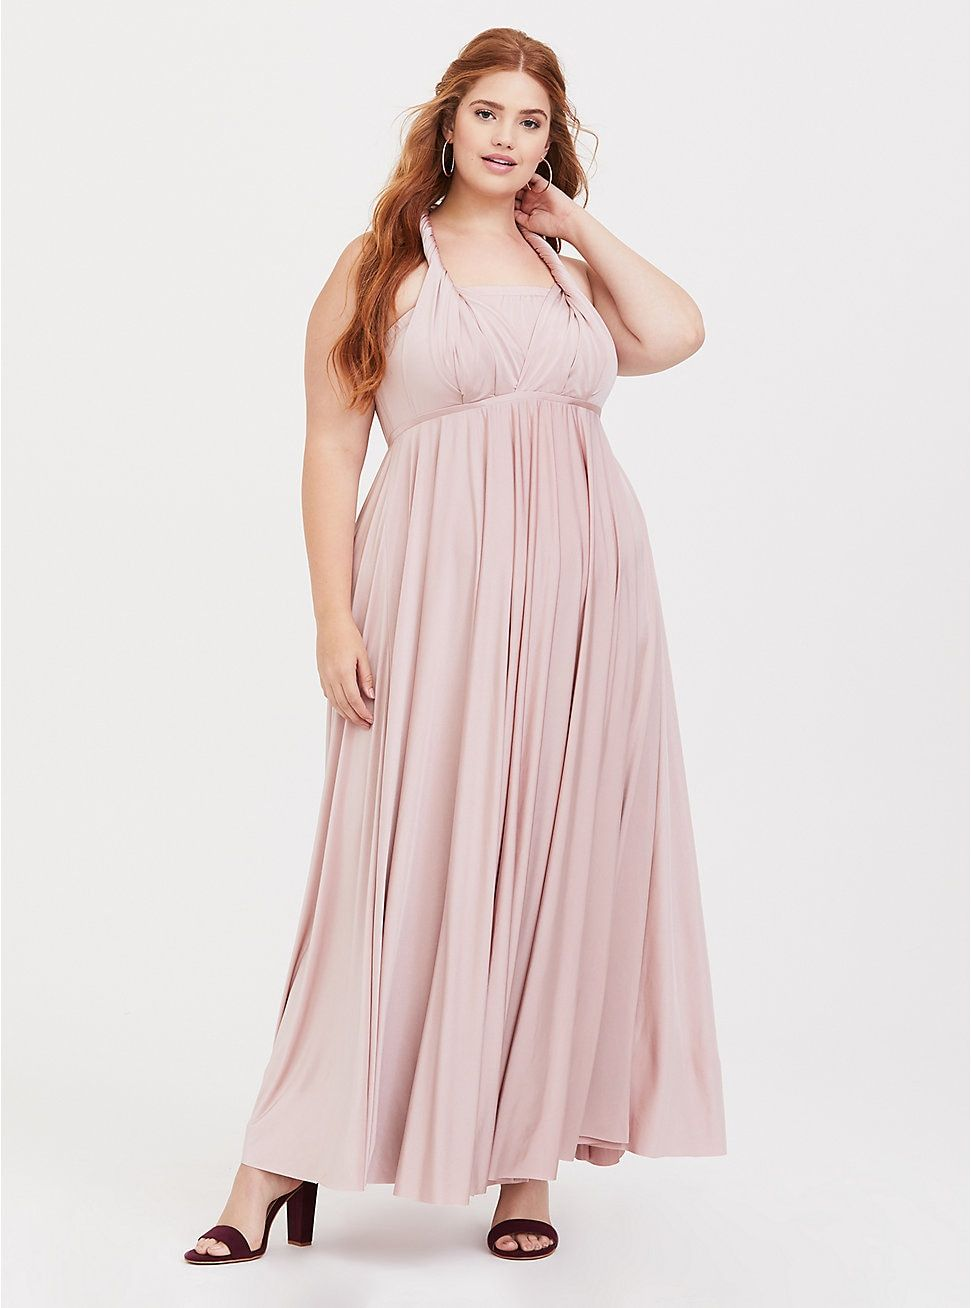 82b3bd5e896 Plus Size Special Occasion Pink Studio Knit Convertible Maxi Dress